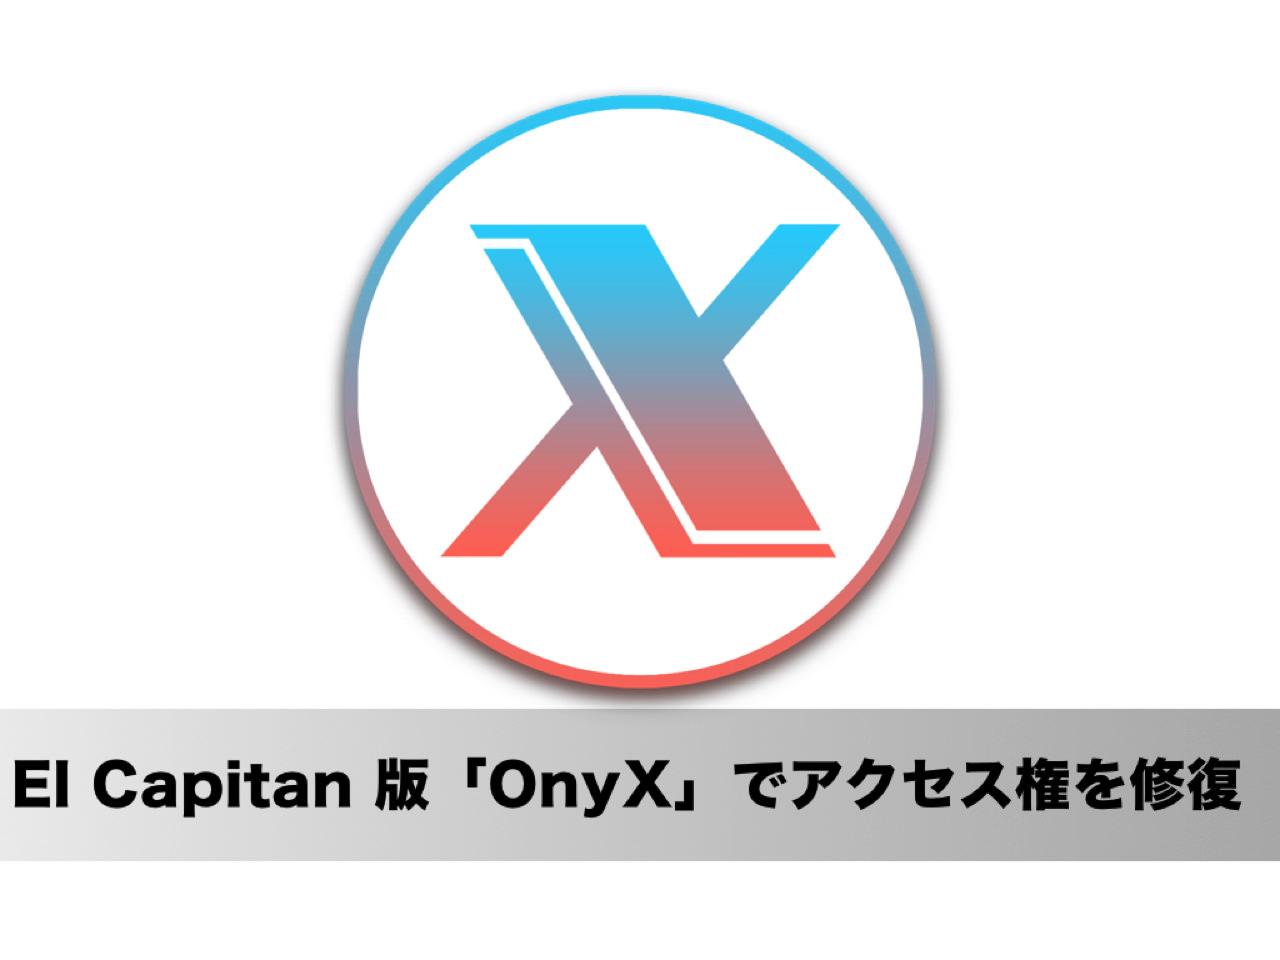 OnyX 使い方:「OS X El Capitan」で削除された「アクセス権の修復」を実行する方法